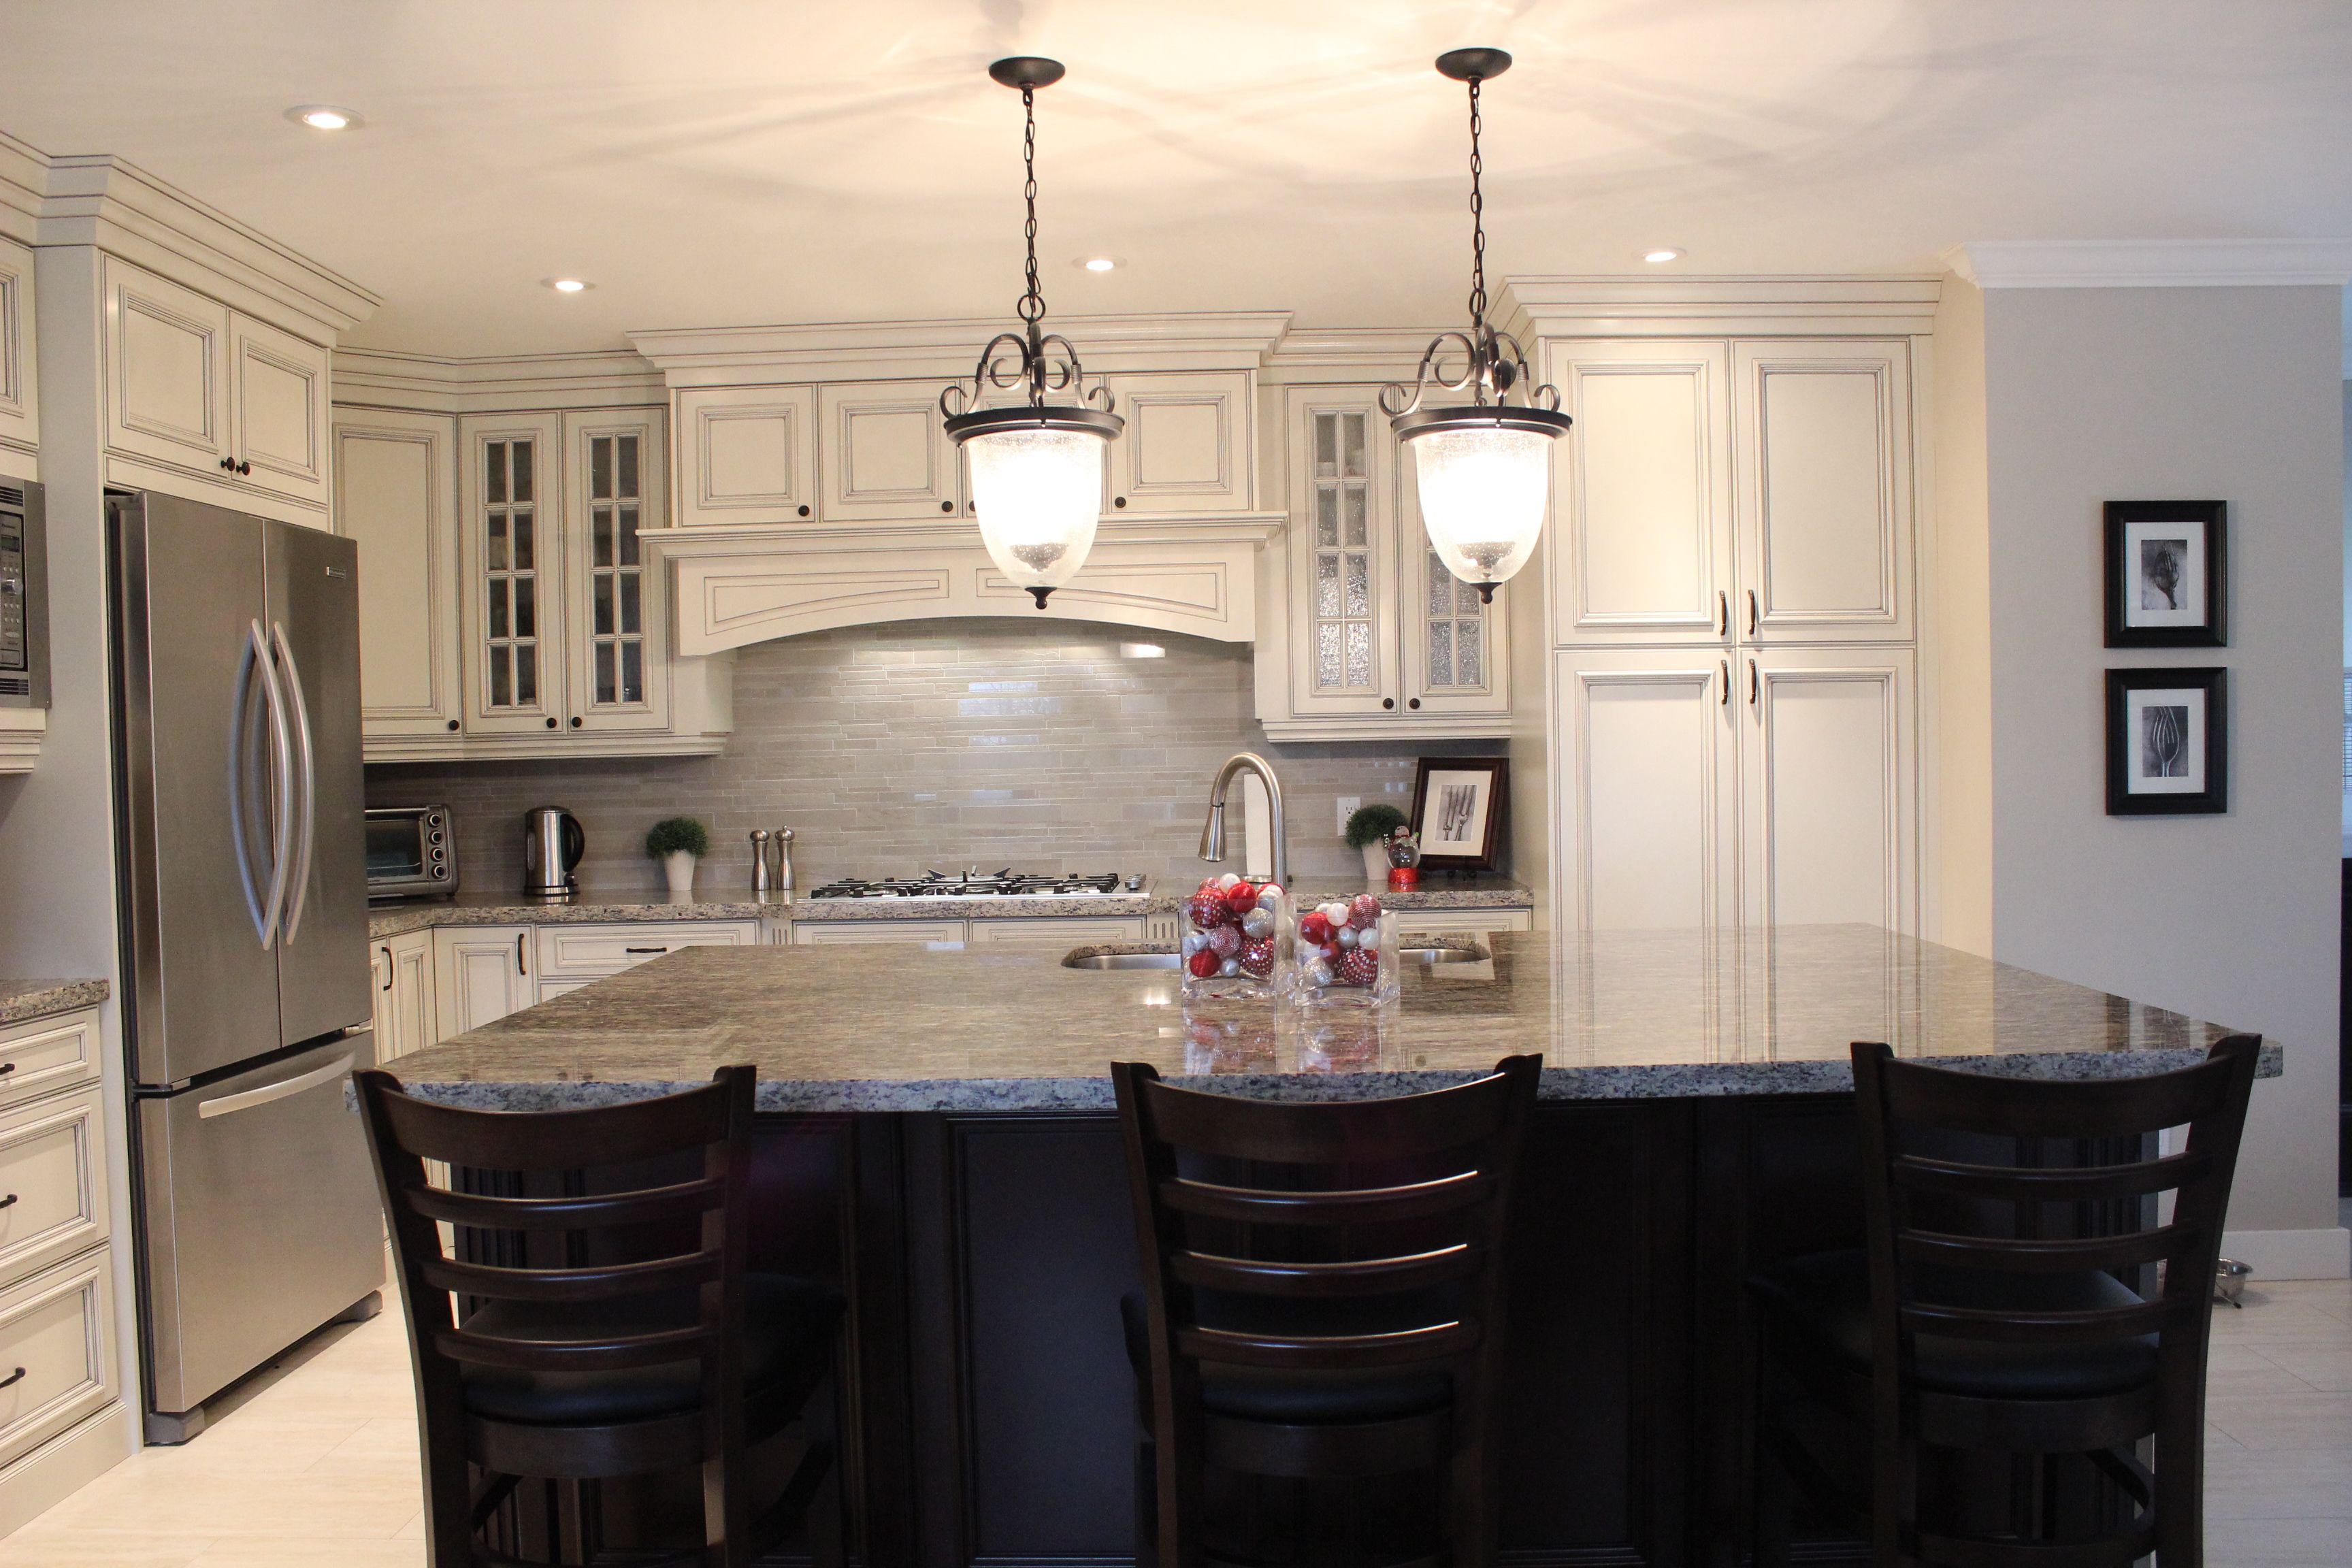 This kitchen features Kitchen Craft s Wellington doorstyle in